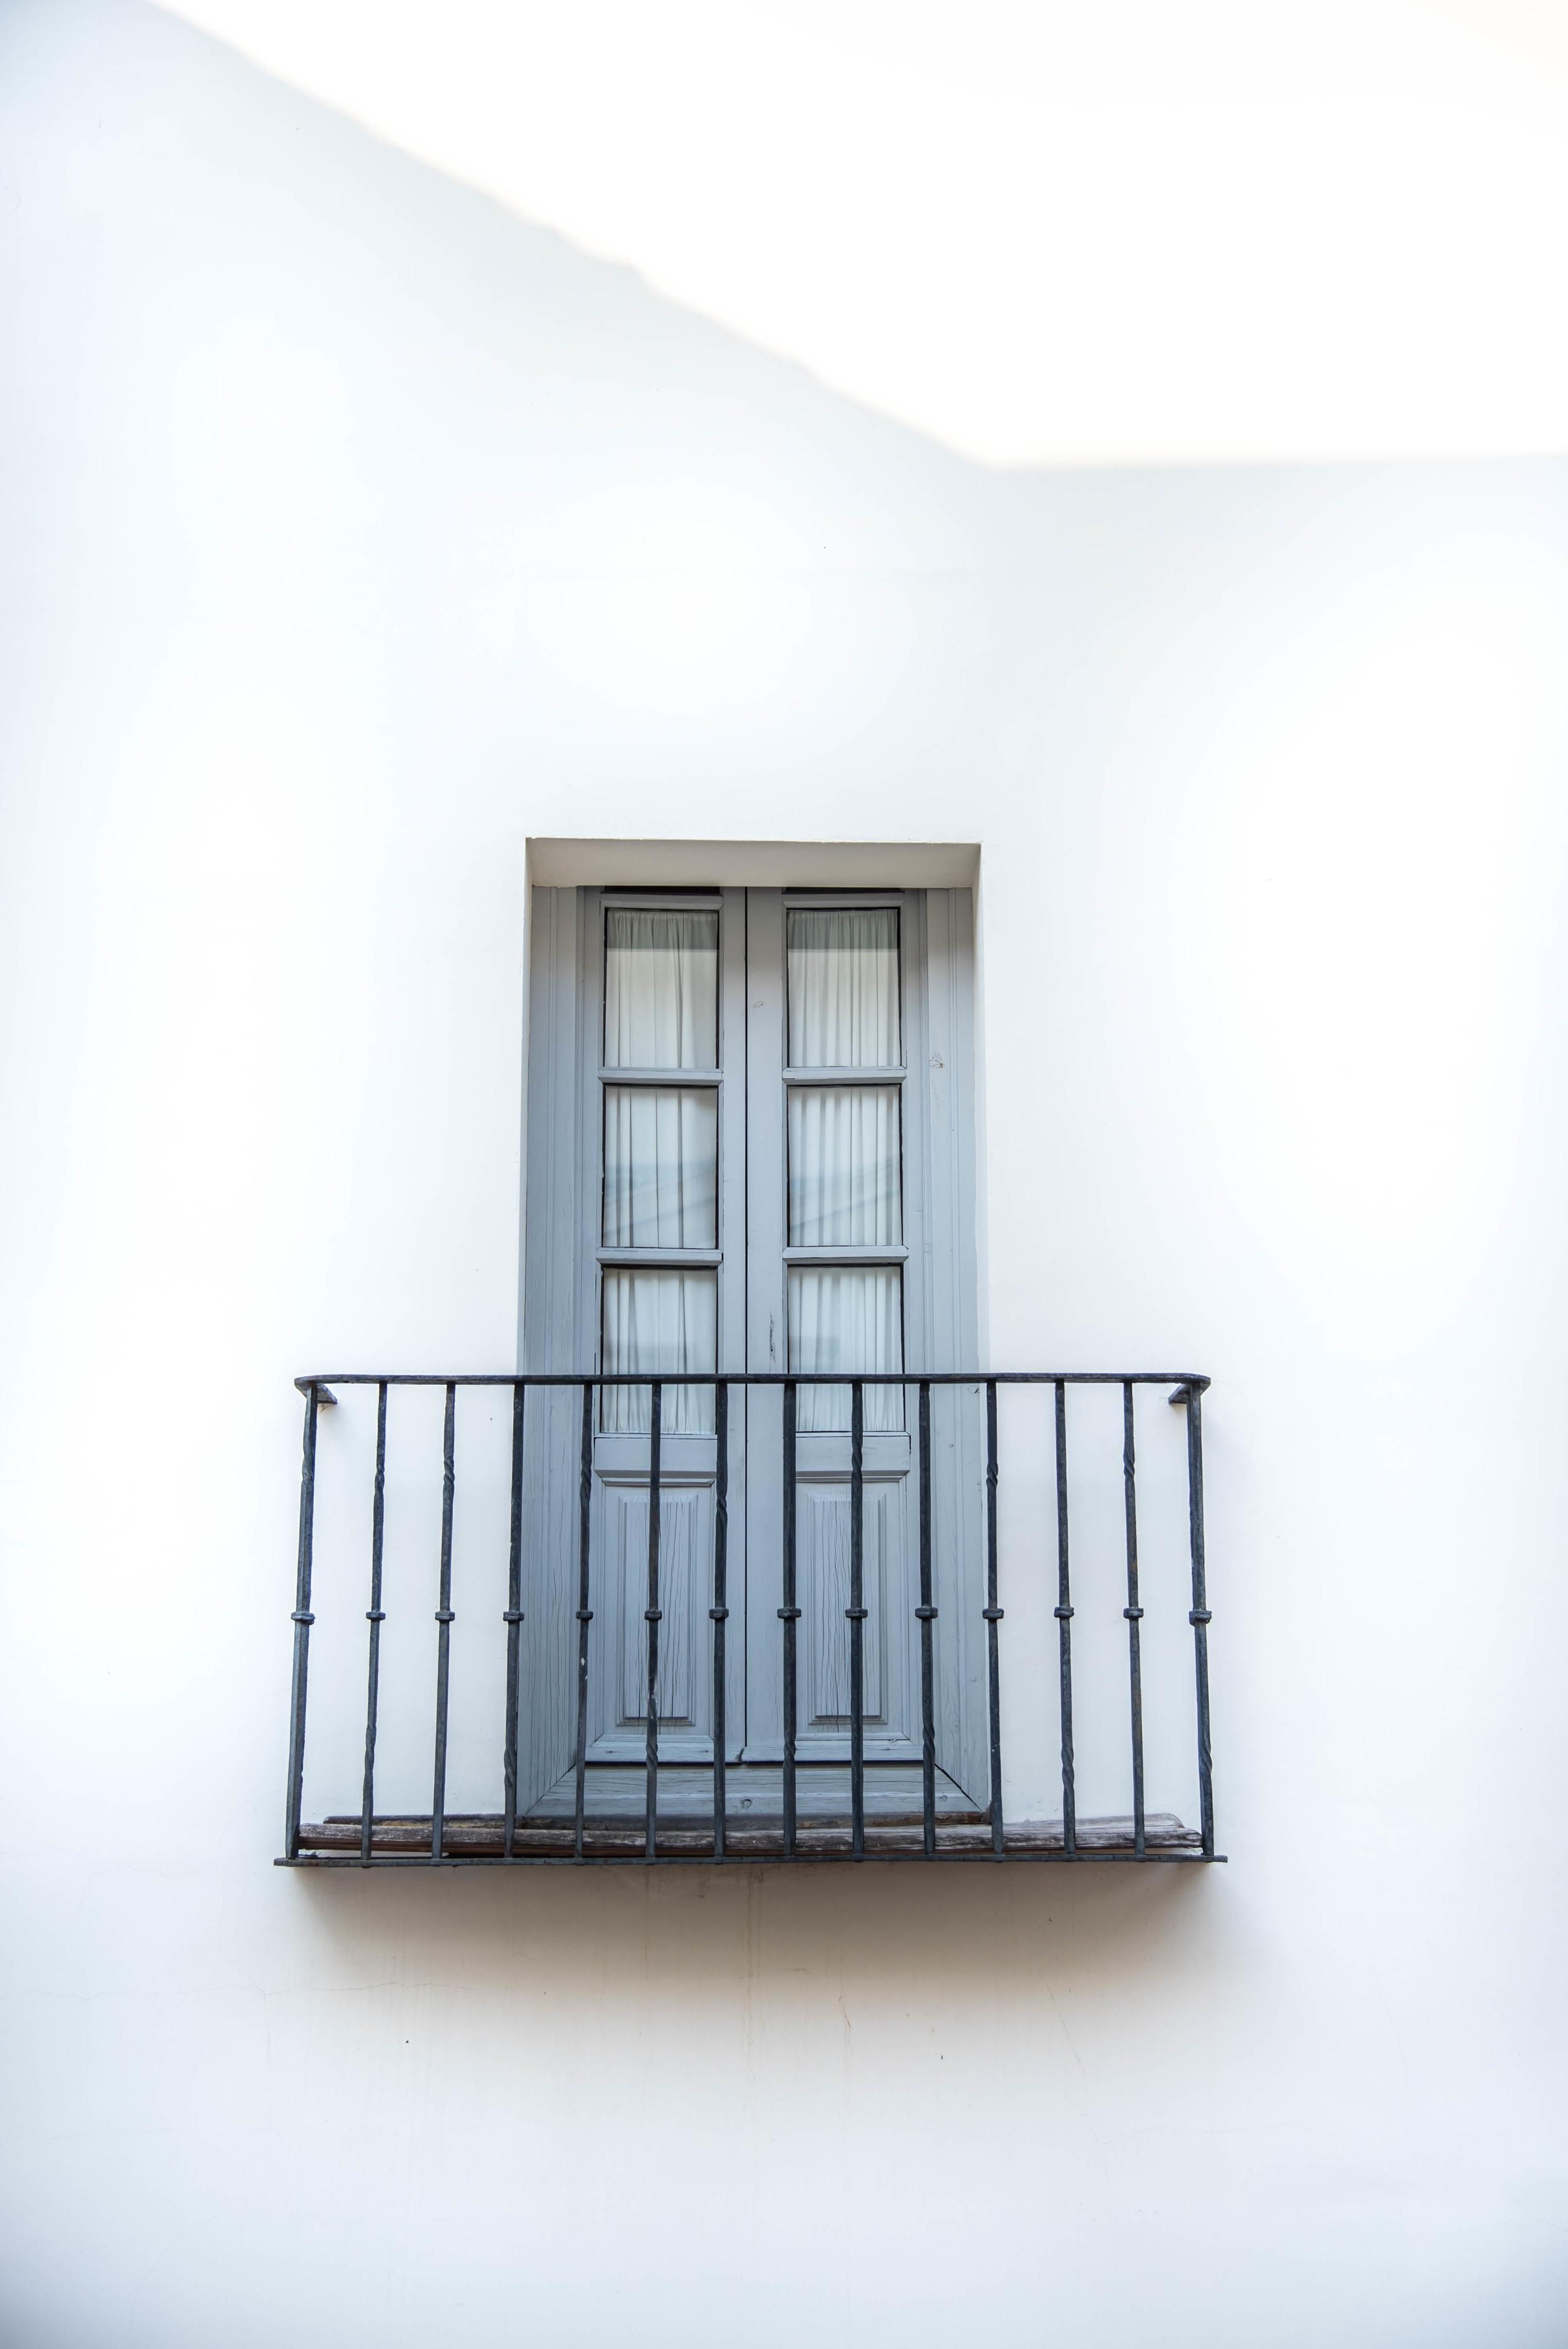 ROSE & IVY Journal Escape Casas de la Juderia Cordoba Spain